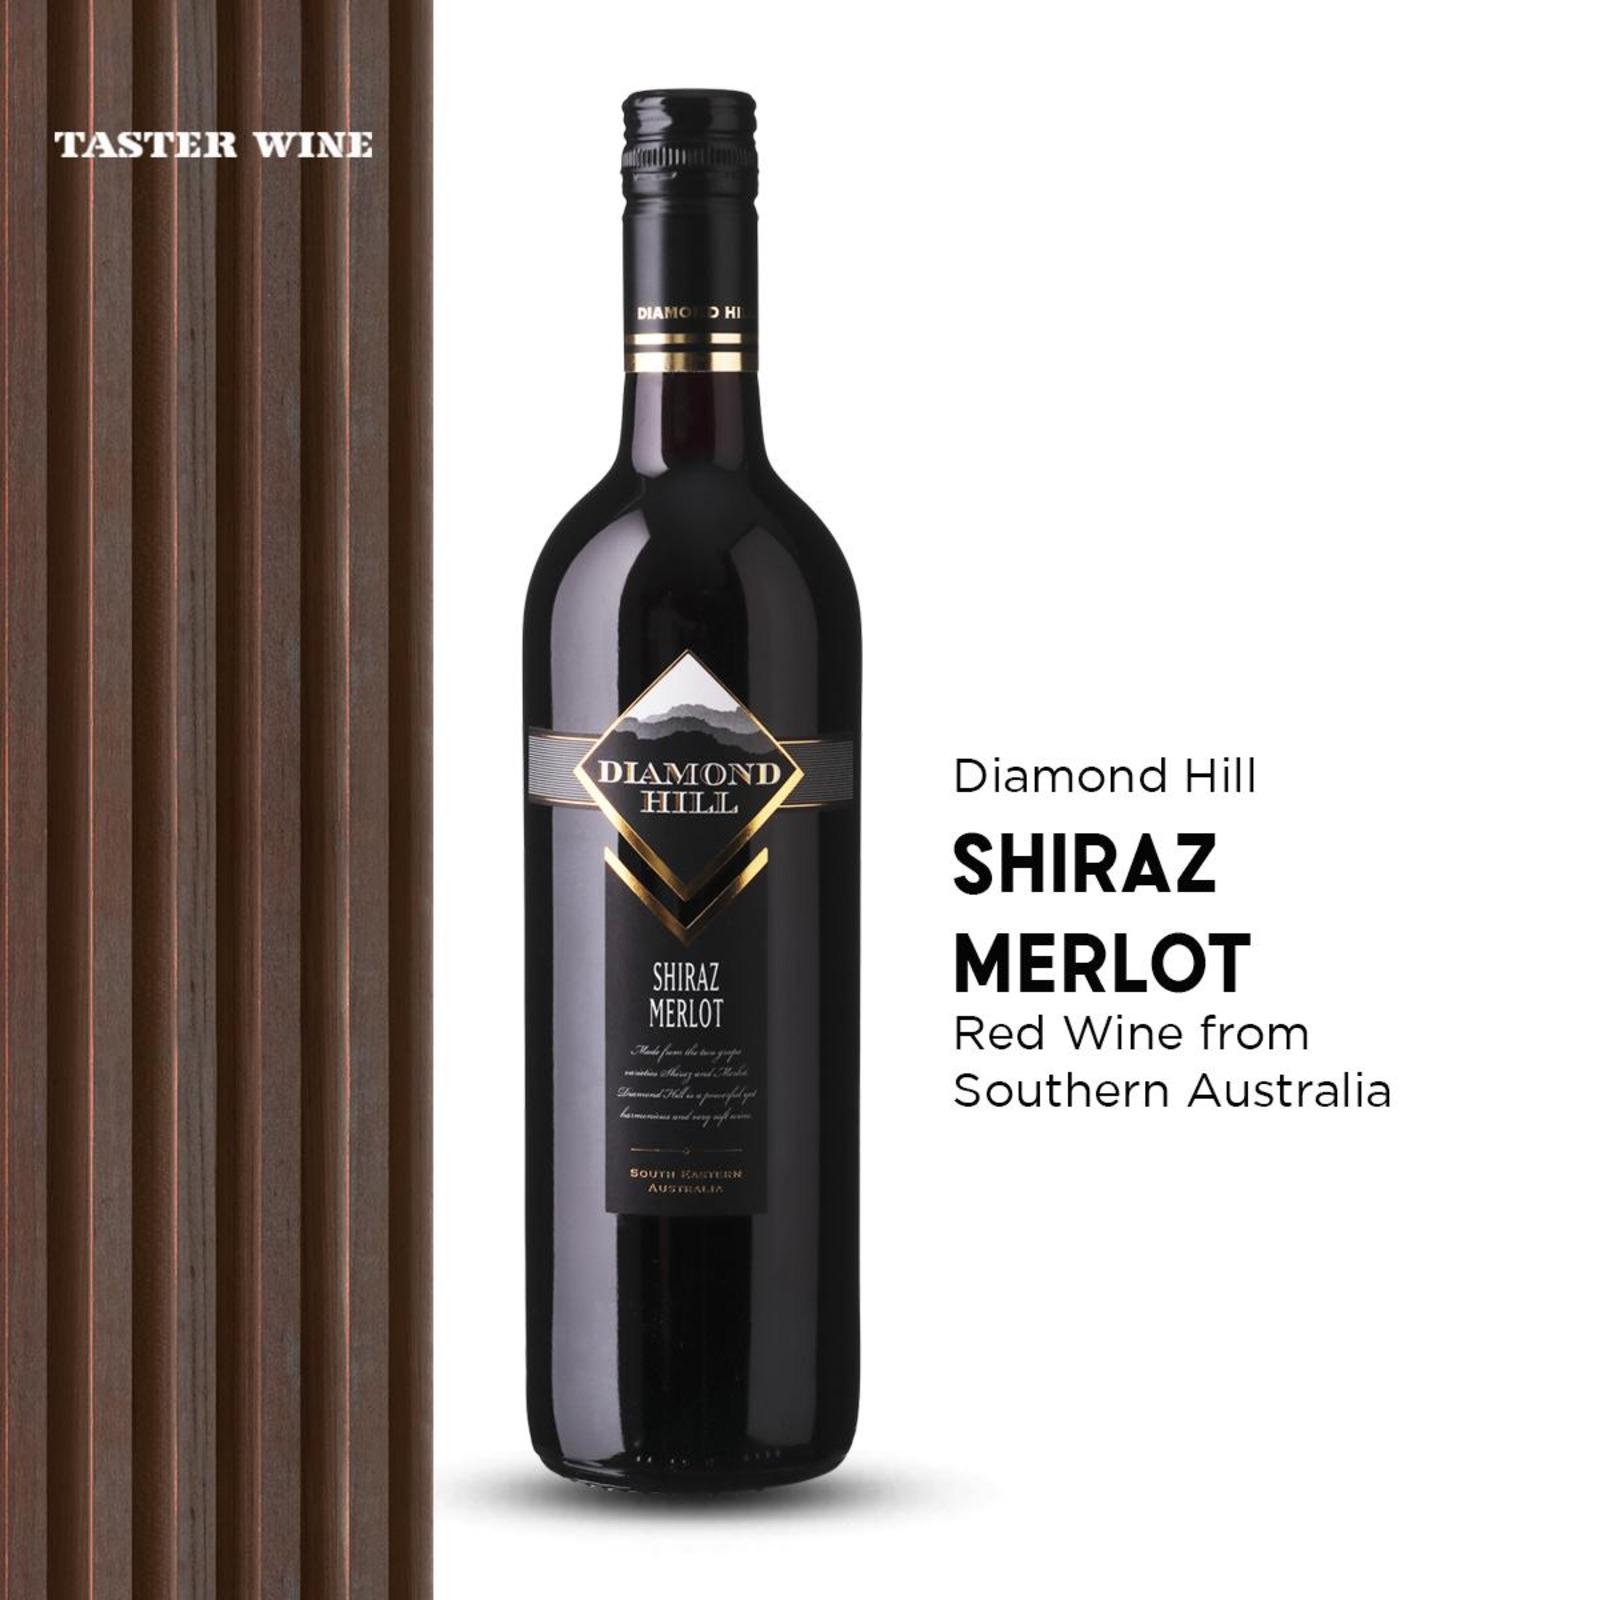 Diamond Hill Shiraz/Merlot - Red Wine